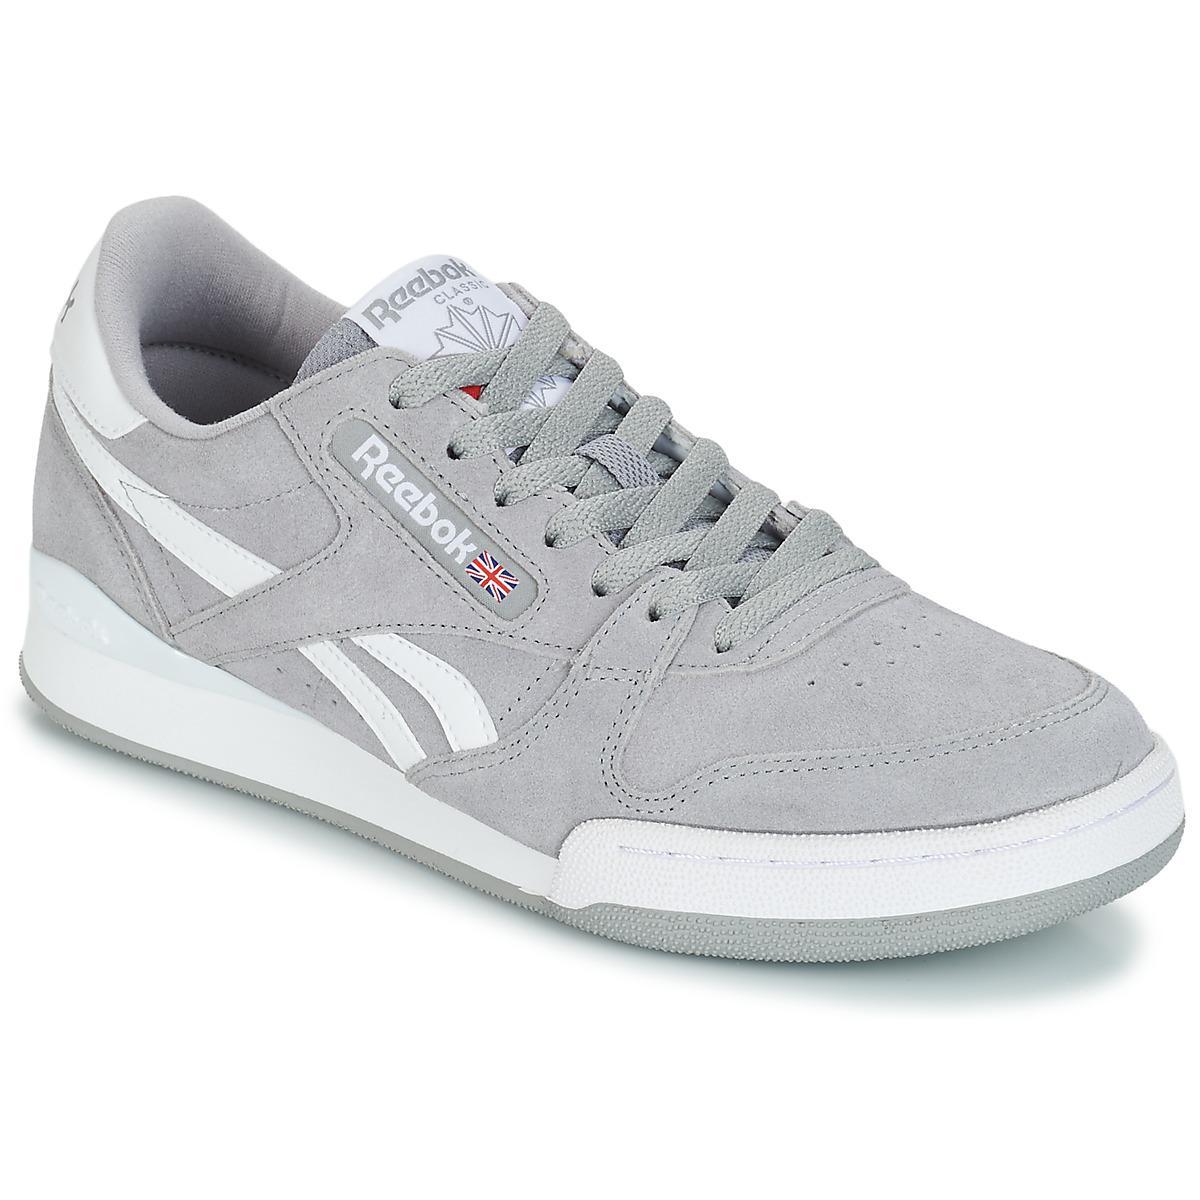 8d0d952fb89 Reebok - Gray Phase 1 Pro Mu Men s Shoes (trainers) In Grey for Men. View  fullscreen